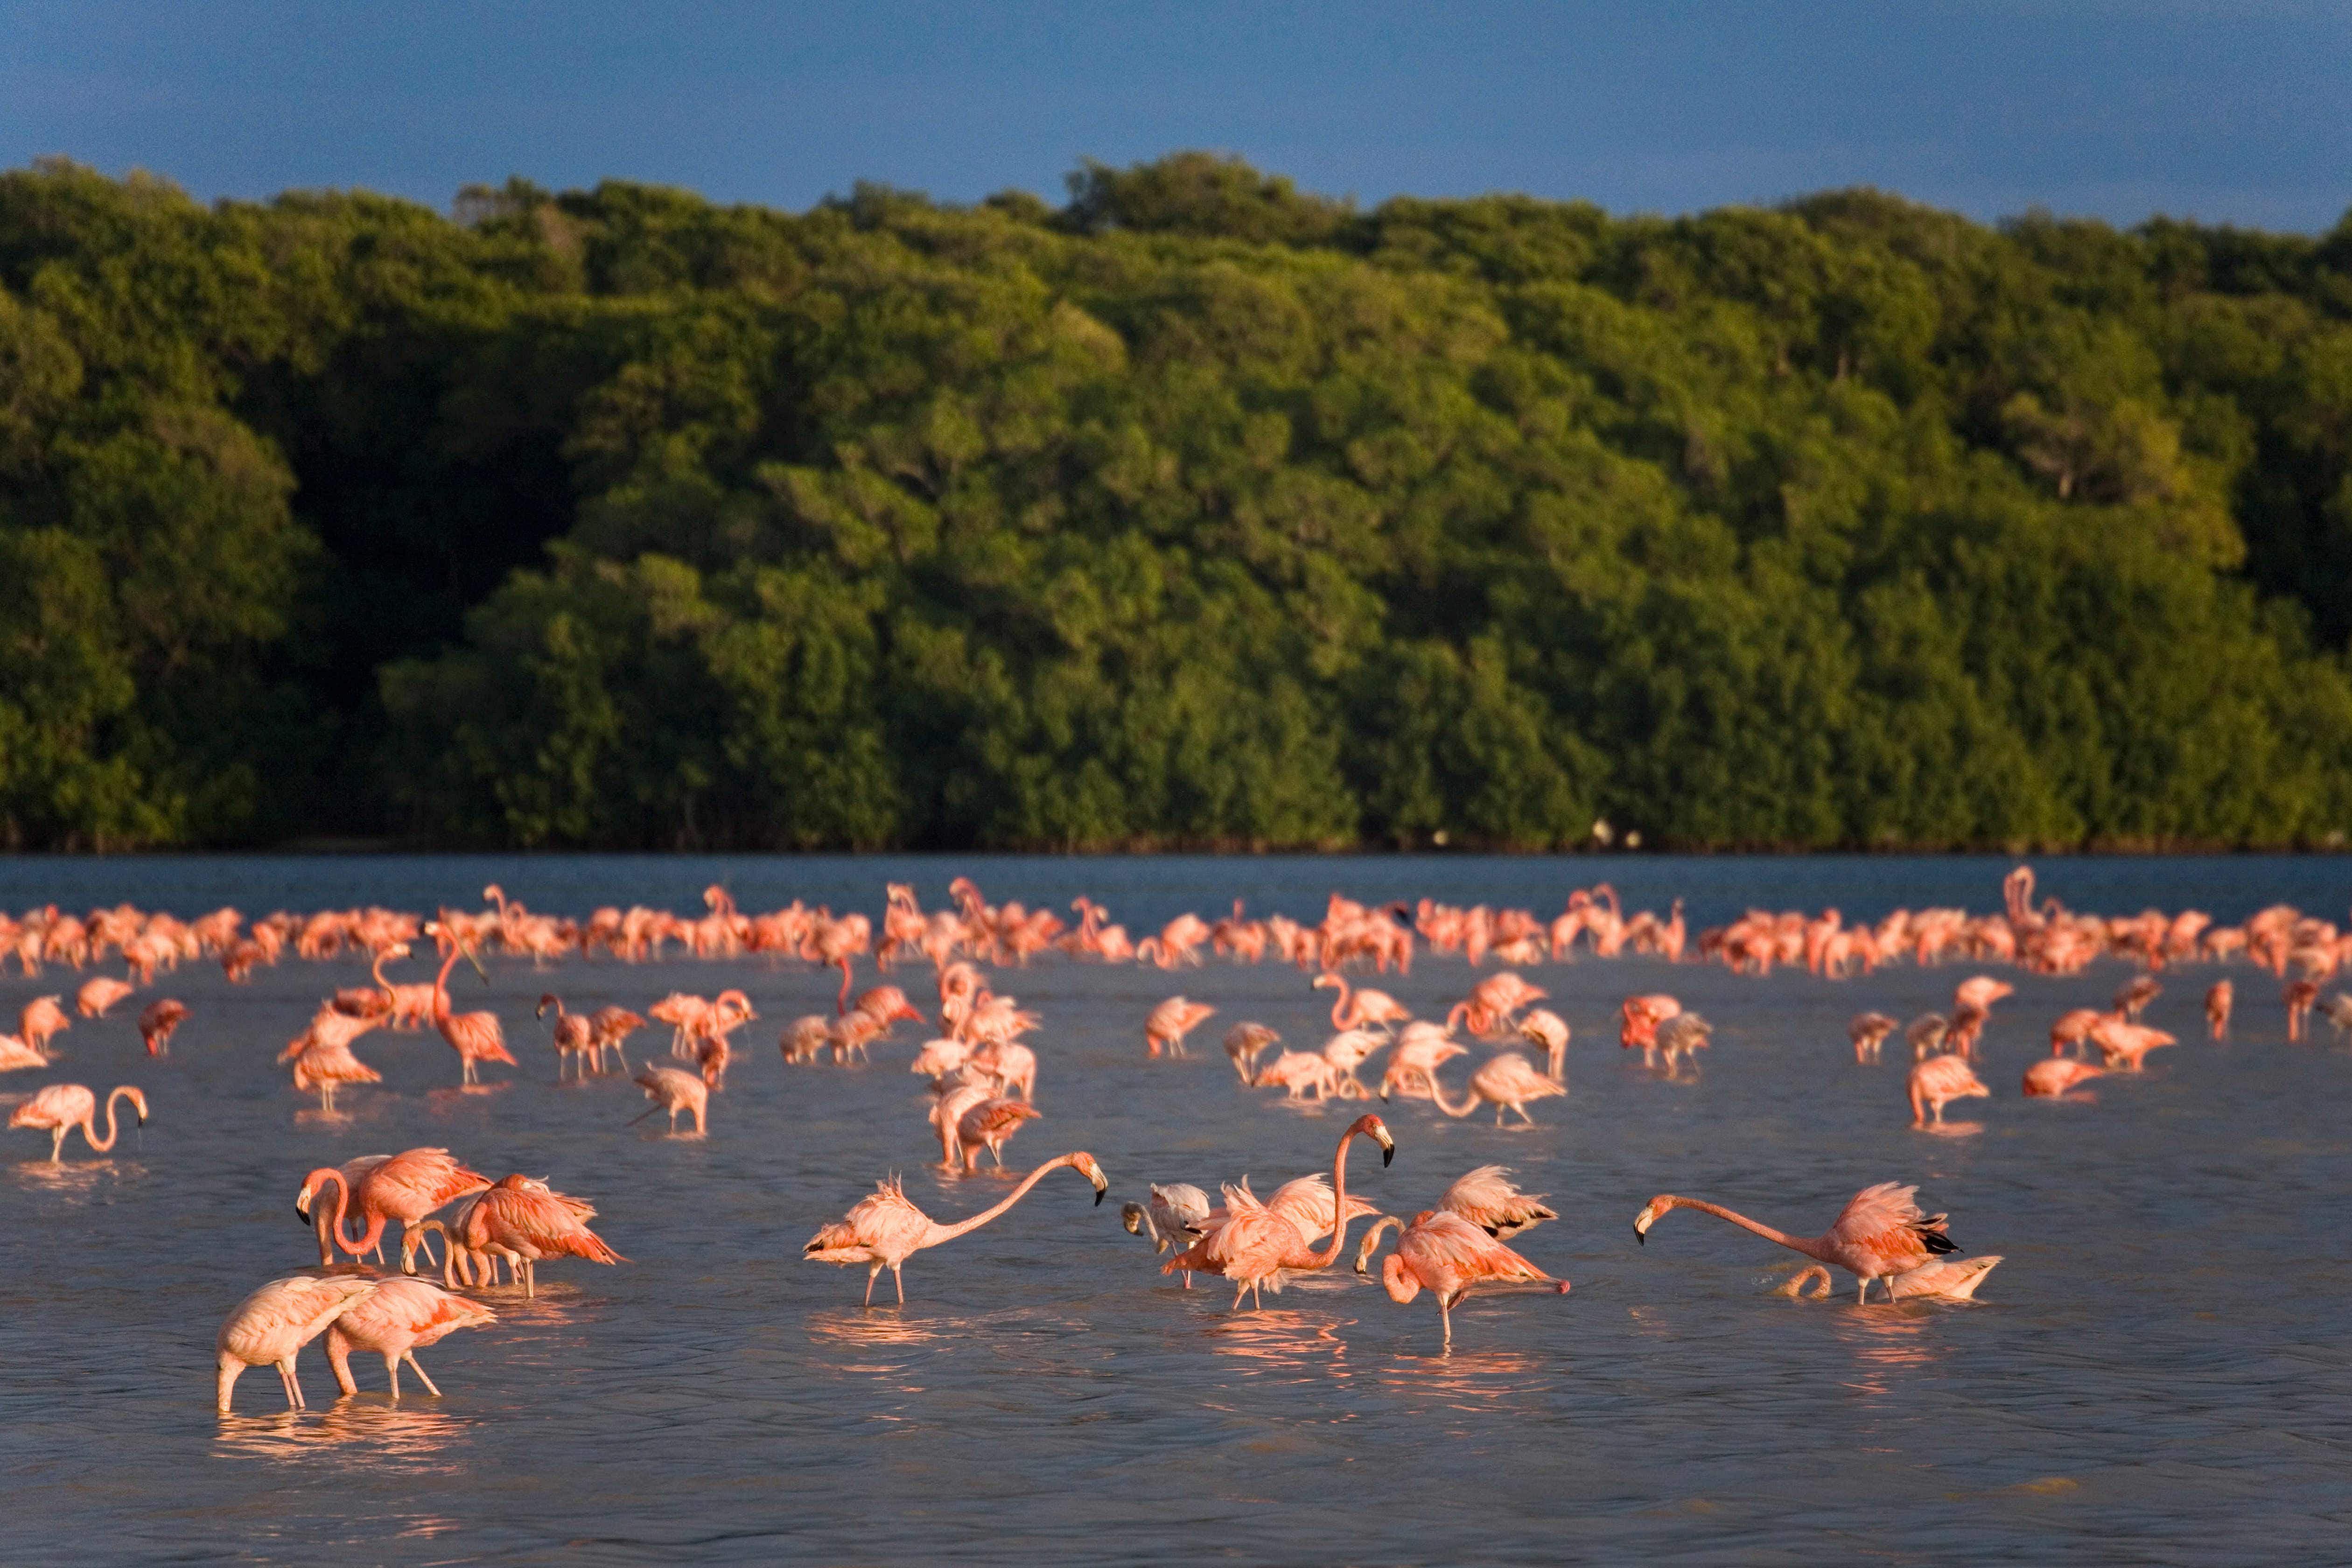 A flamboyance of flamingos returns to Progreso, Mexico